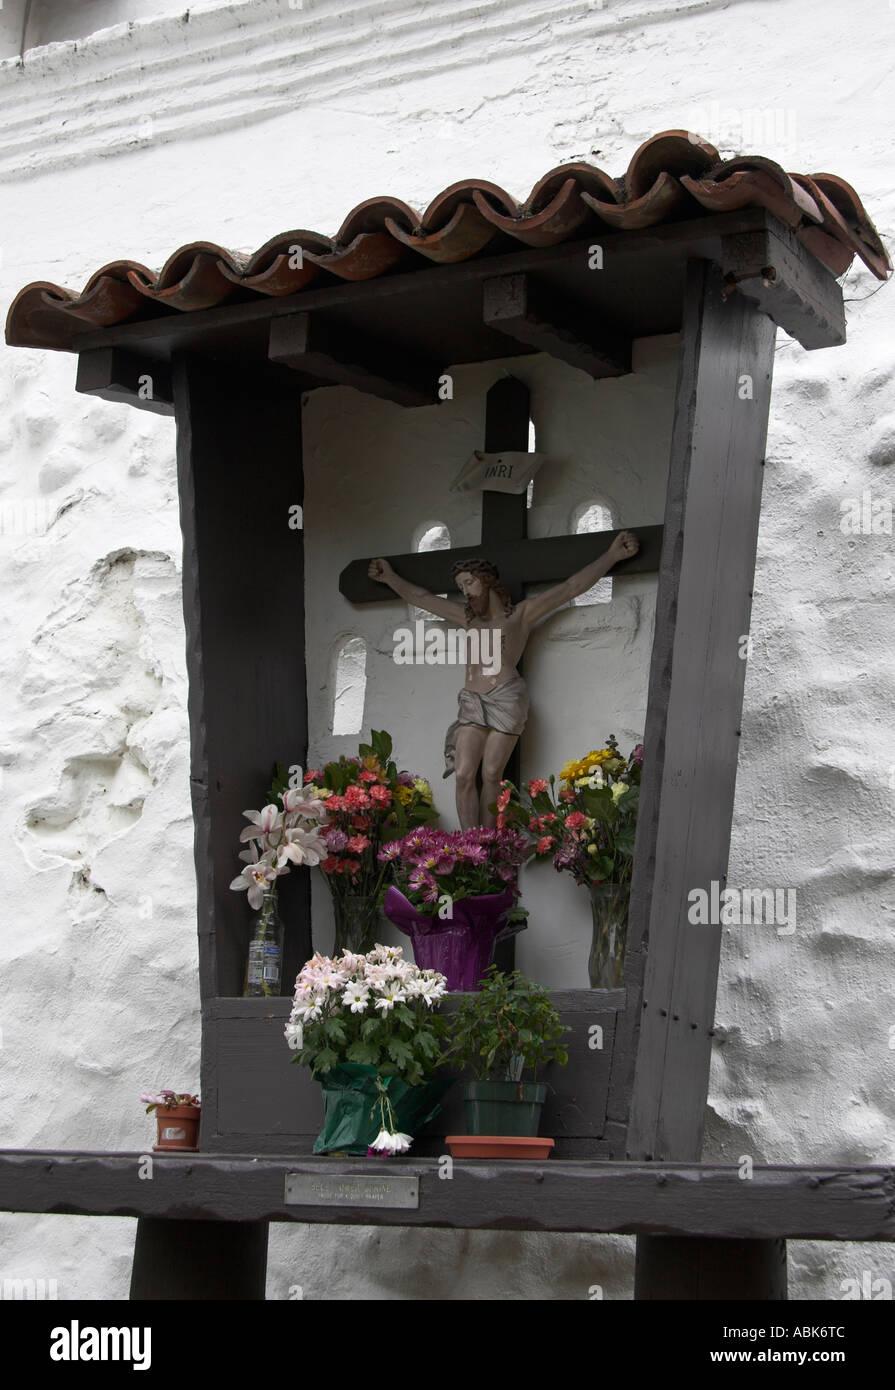 Wooden crucifix, Mission San Diego de Alcala, San Diego, California, USA - Stock Image